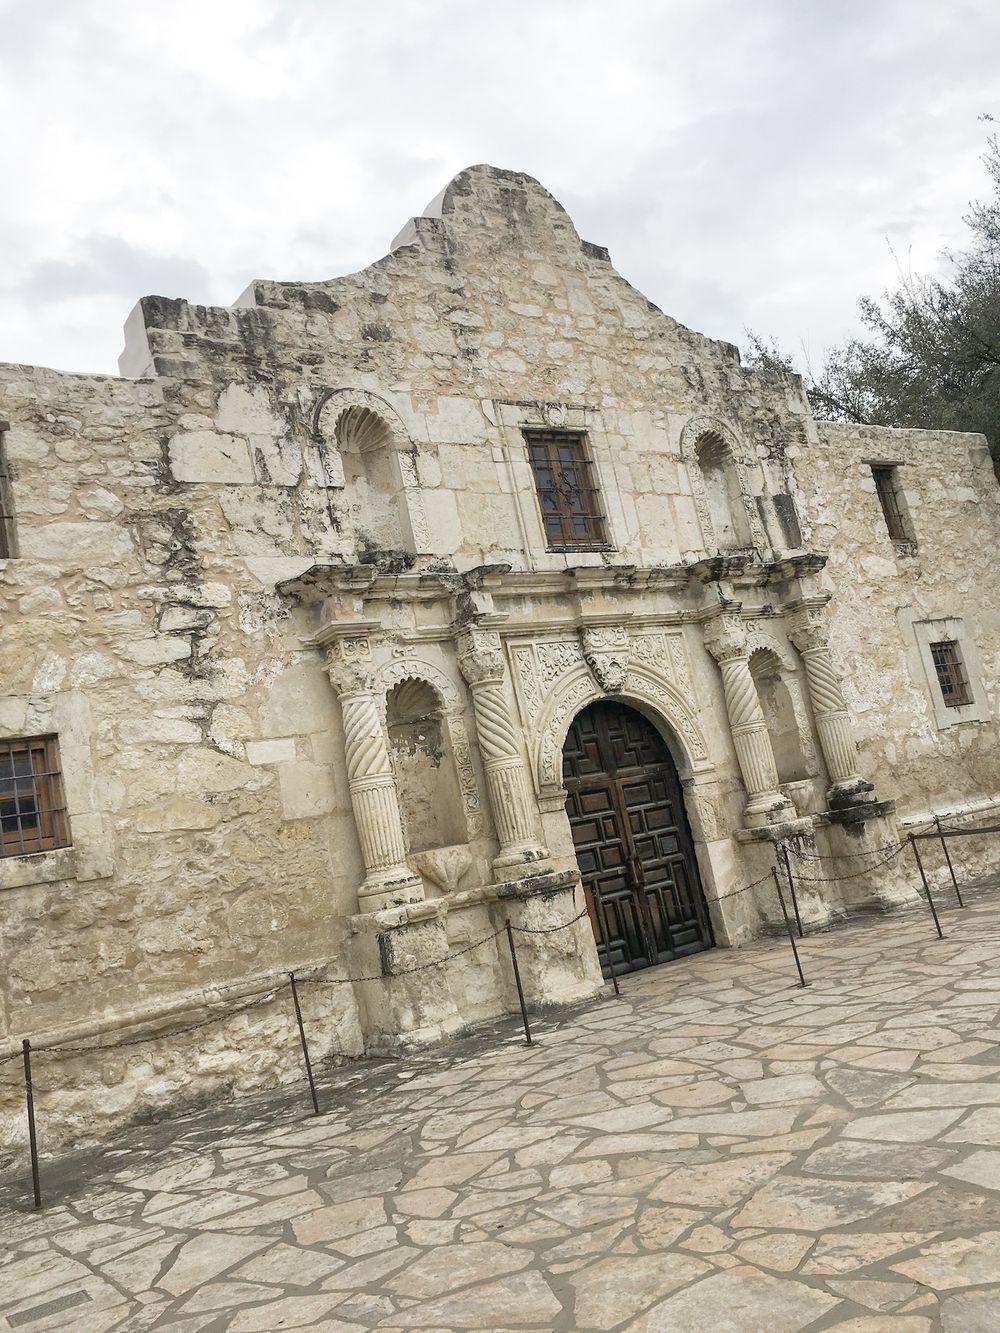 The Alamo in February, San Antonio, Texas